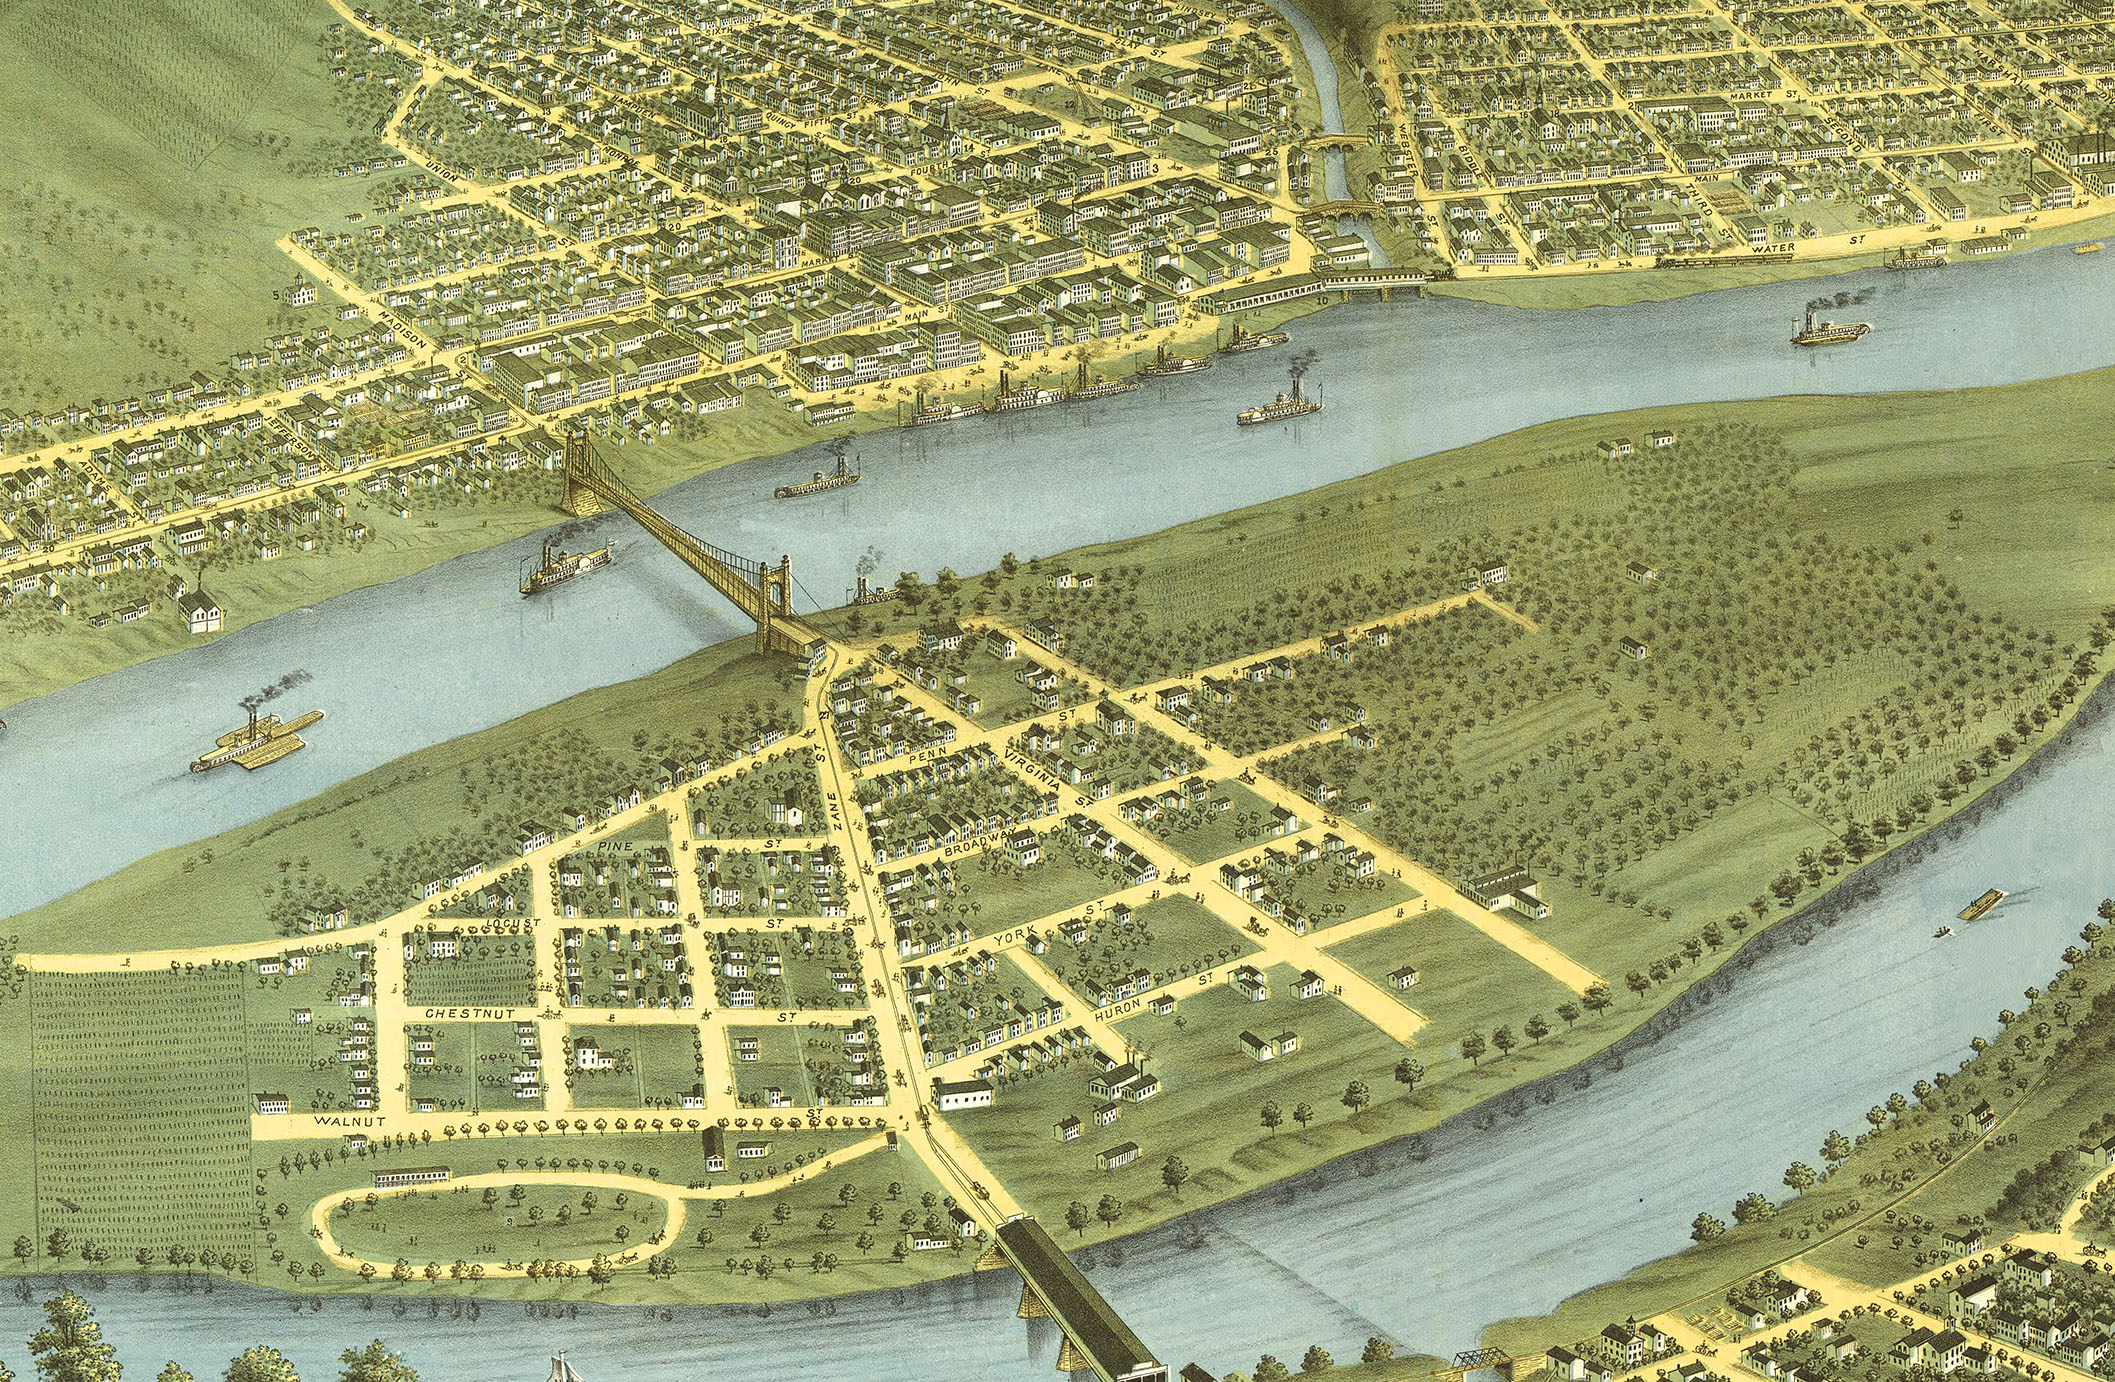 Wheeling (WV) United States  city photos : Wheeling, West Virginia in 1870 Bird's Eye View, Map, Aerial ...